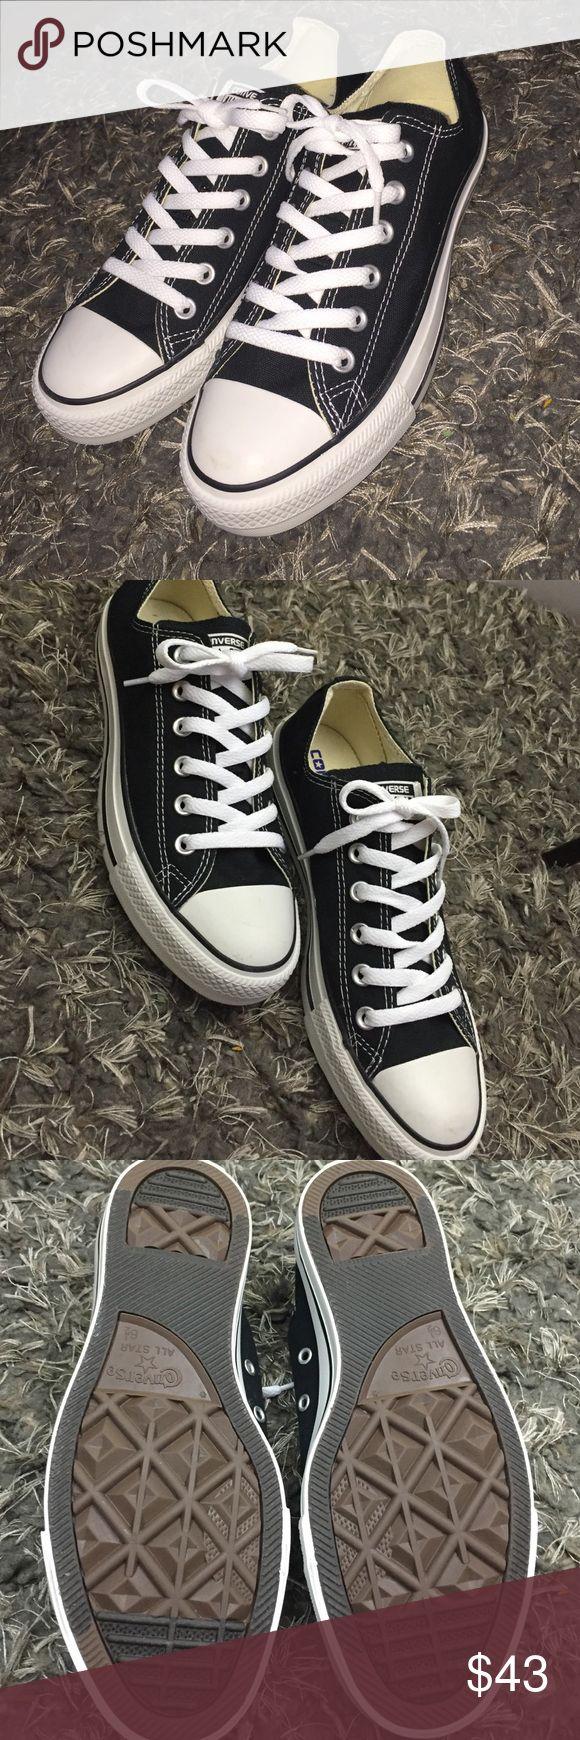 6.5 Black Chuck Taylor Converse (Never Worn) 6.5 Black Converse (Never Worn) Converse Shoes Sneakers